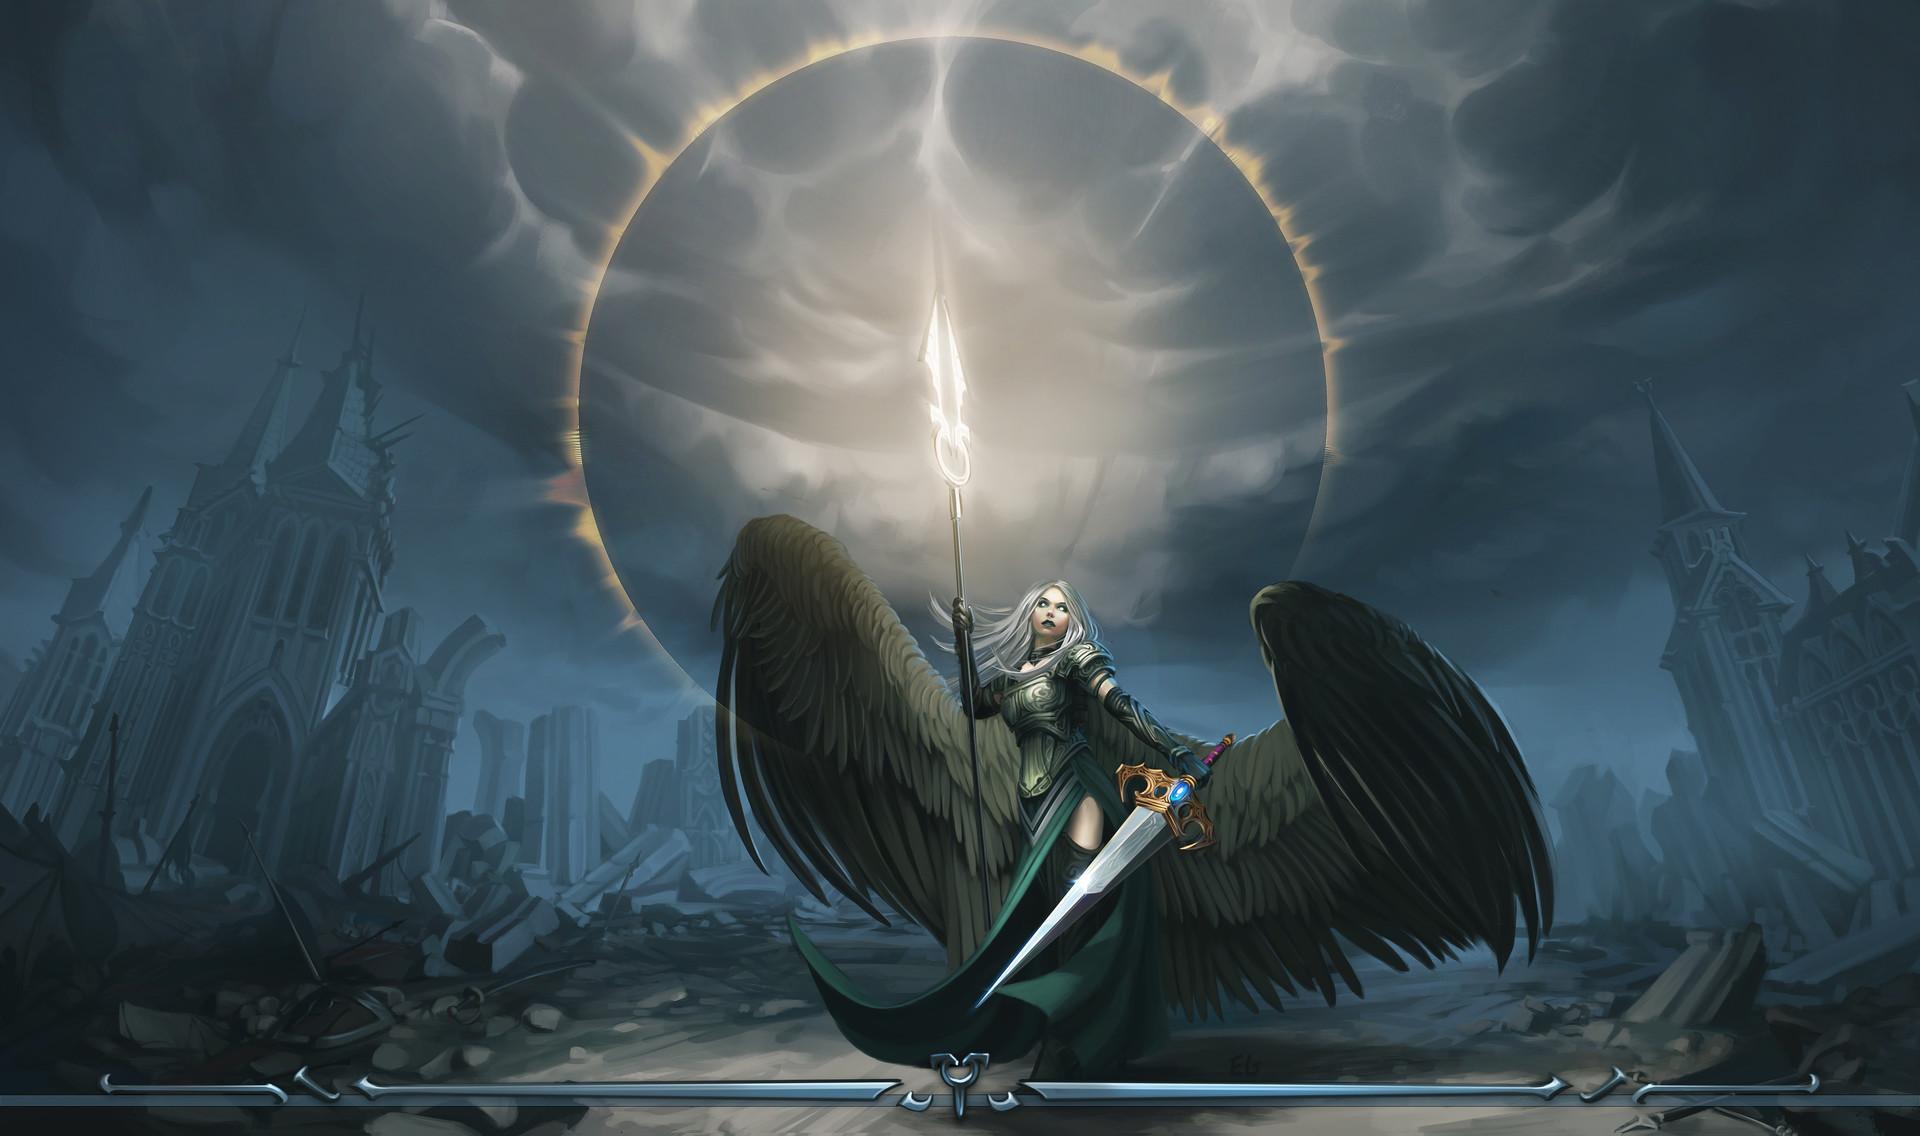 Eric geusz avacyn angel of vengeance